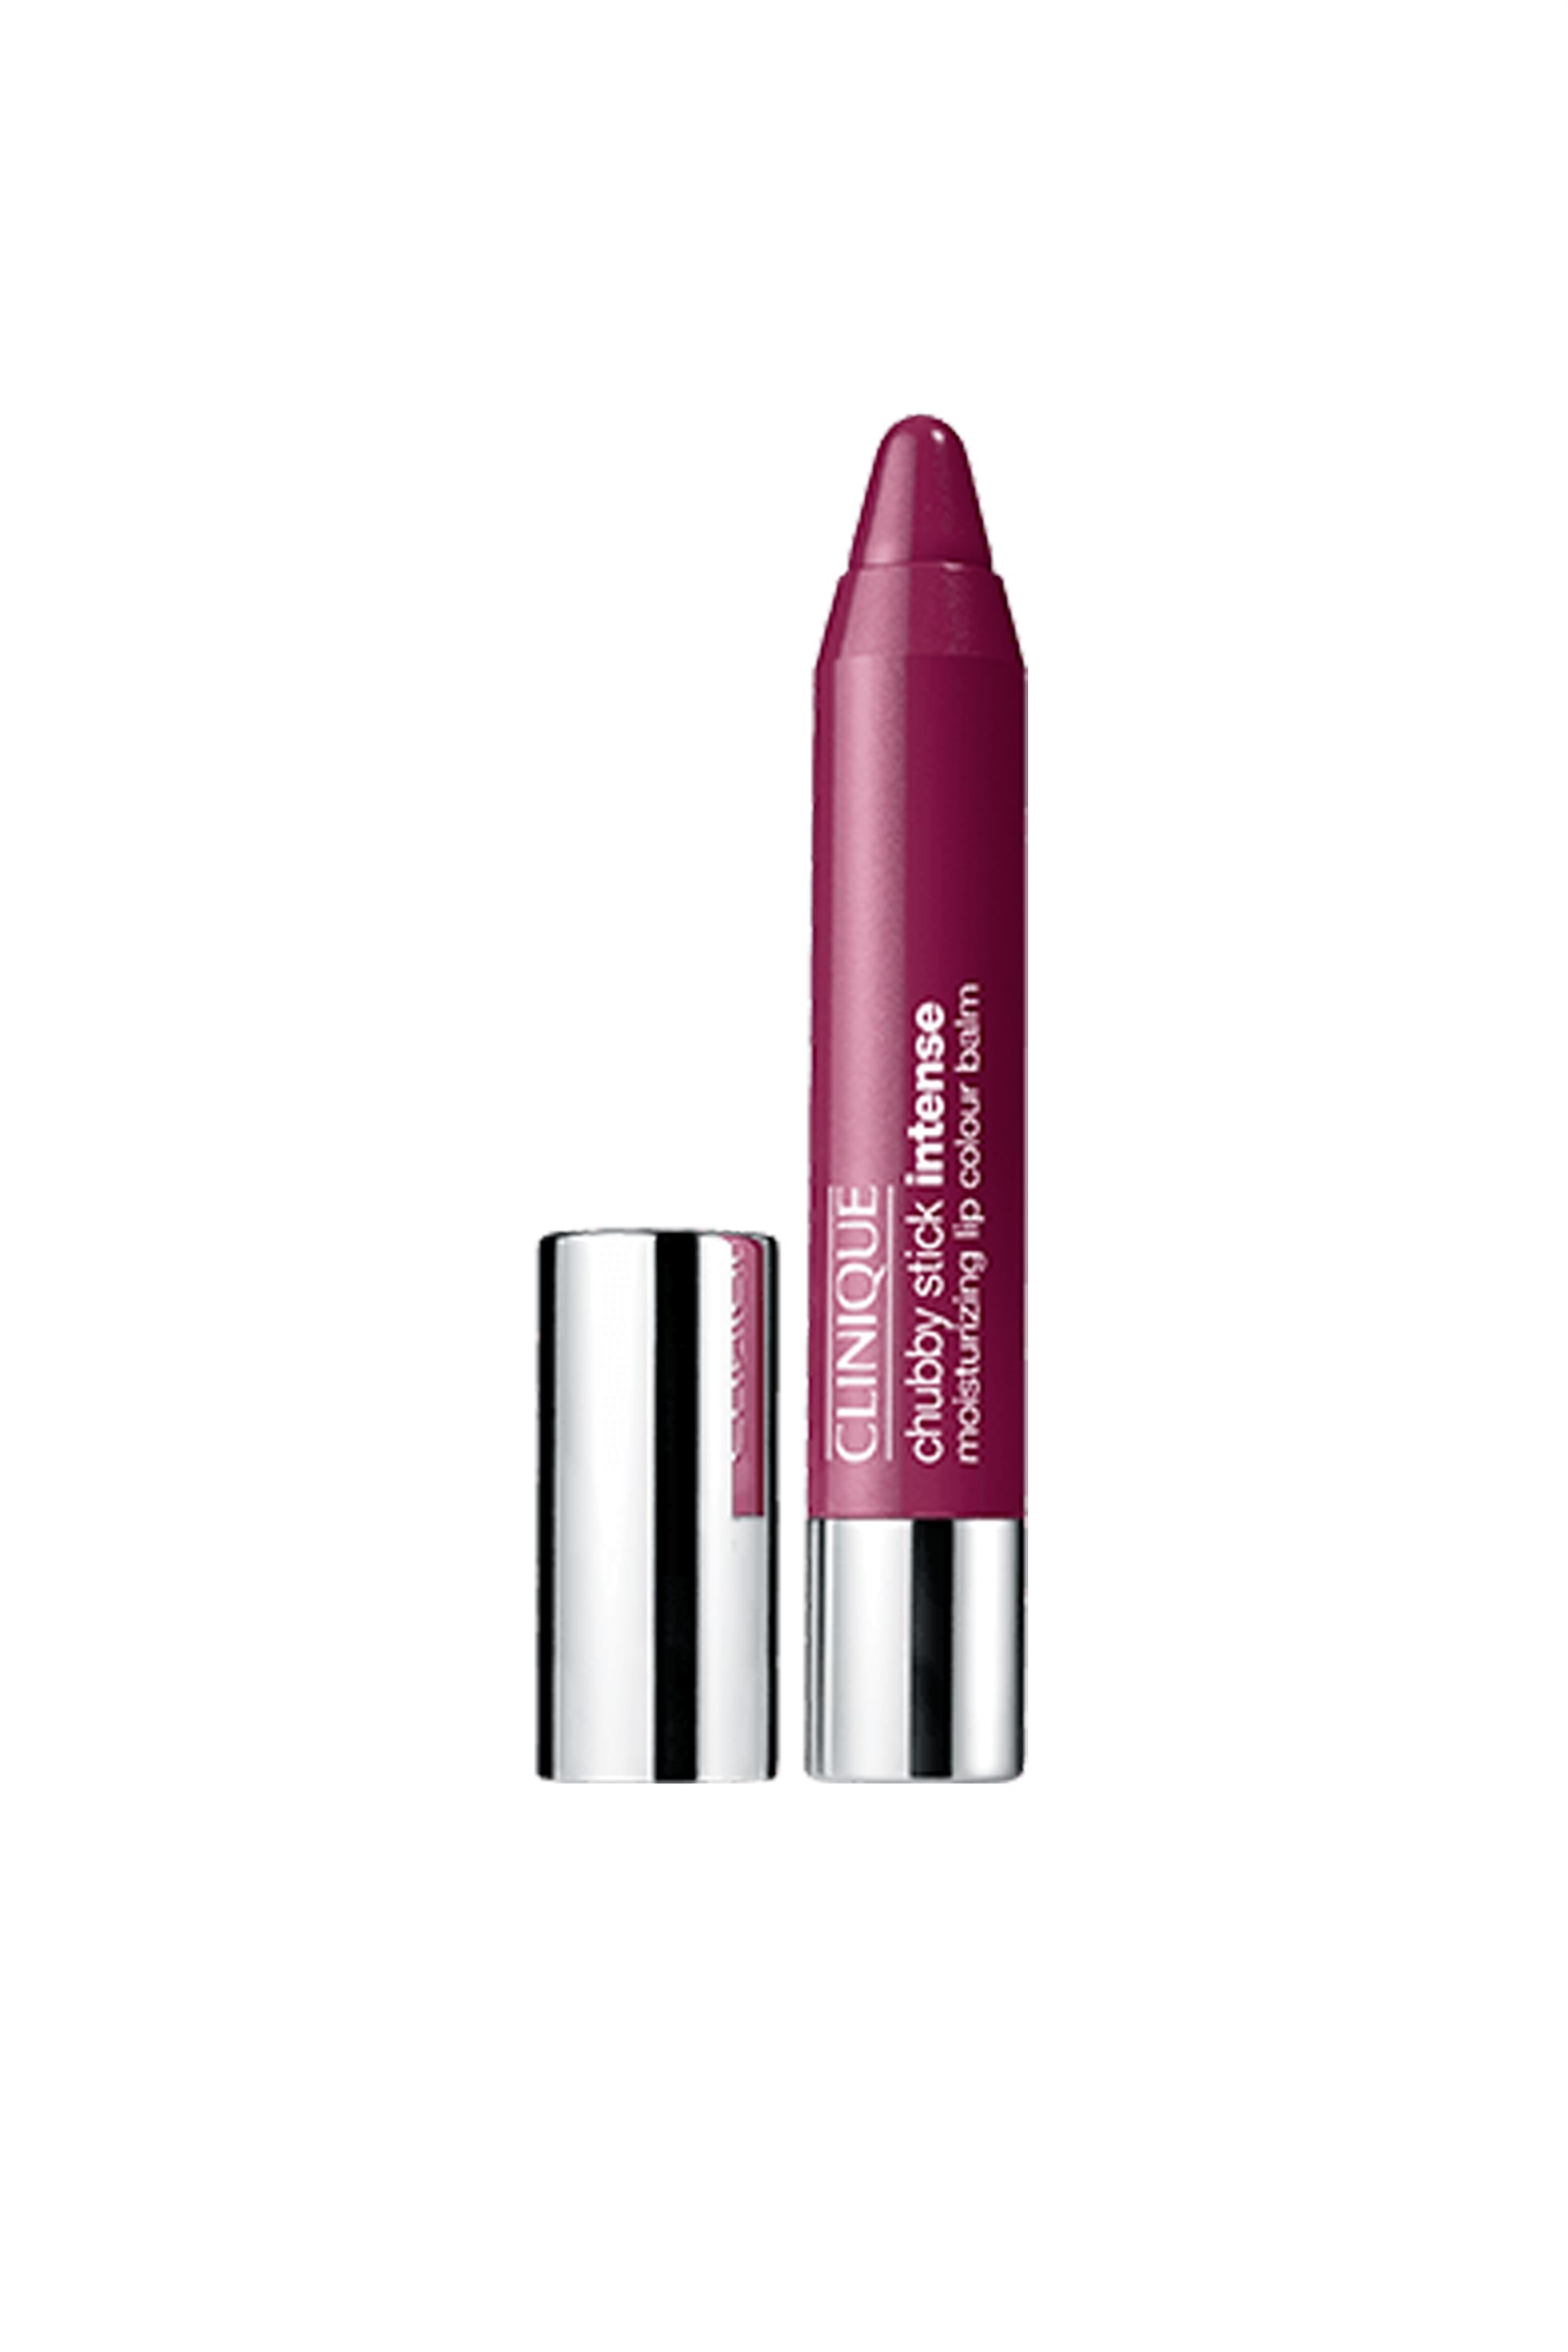 Clinique Chubby Stick Intense™ Moisturizing Lip Colour Balm 08 Grandest Grape 3  ομορφια   καλλυντικα επιλεκτικησ   μακιγιάζ   χείλη   lip gloss   balms